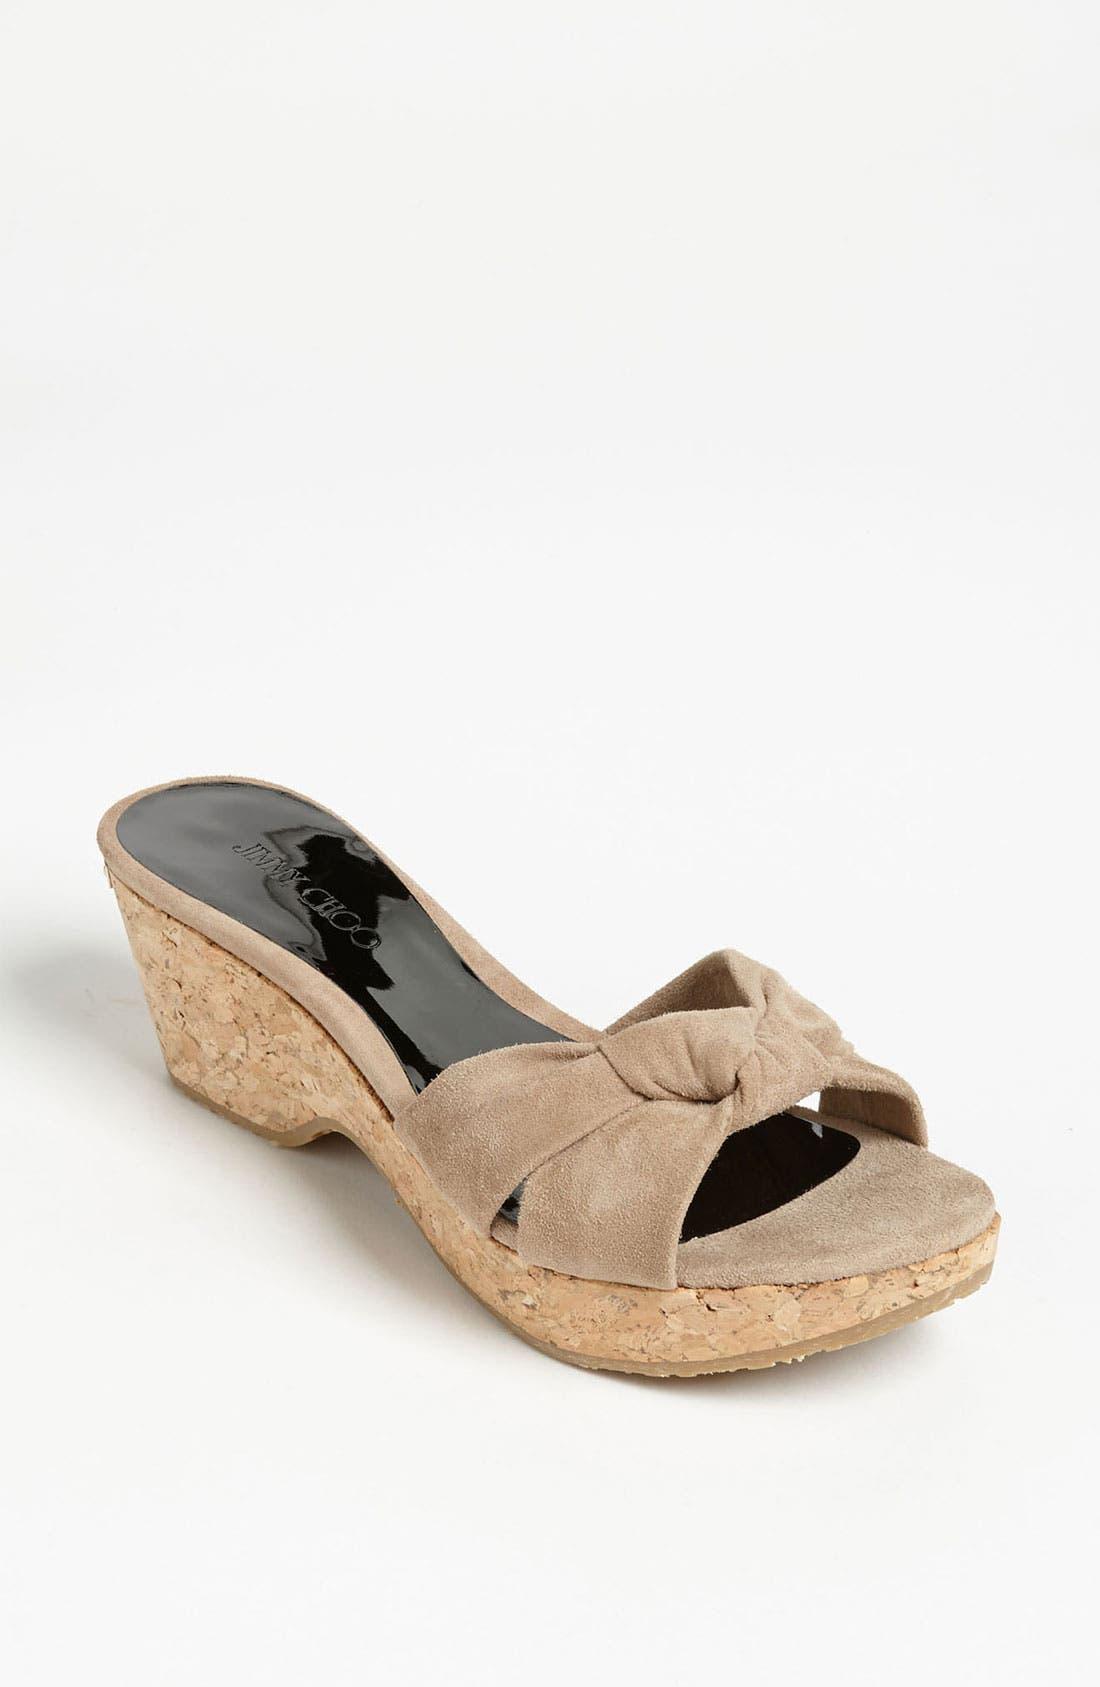 Main Image - Jimmy Choo 'Glace' Slide Sandal